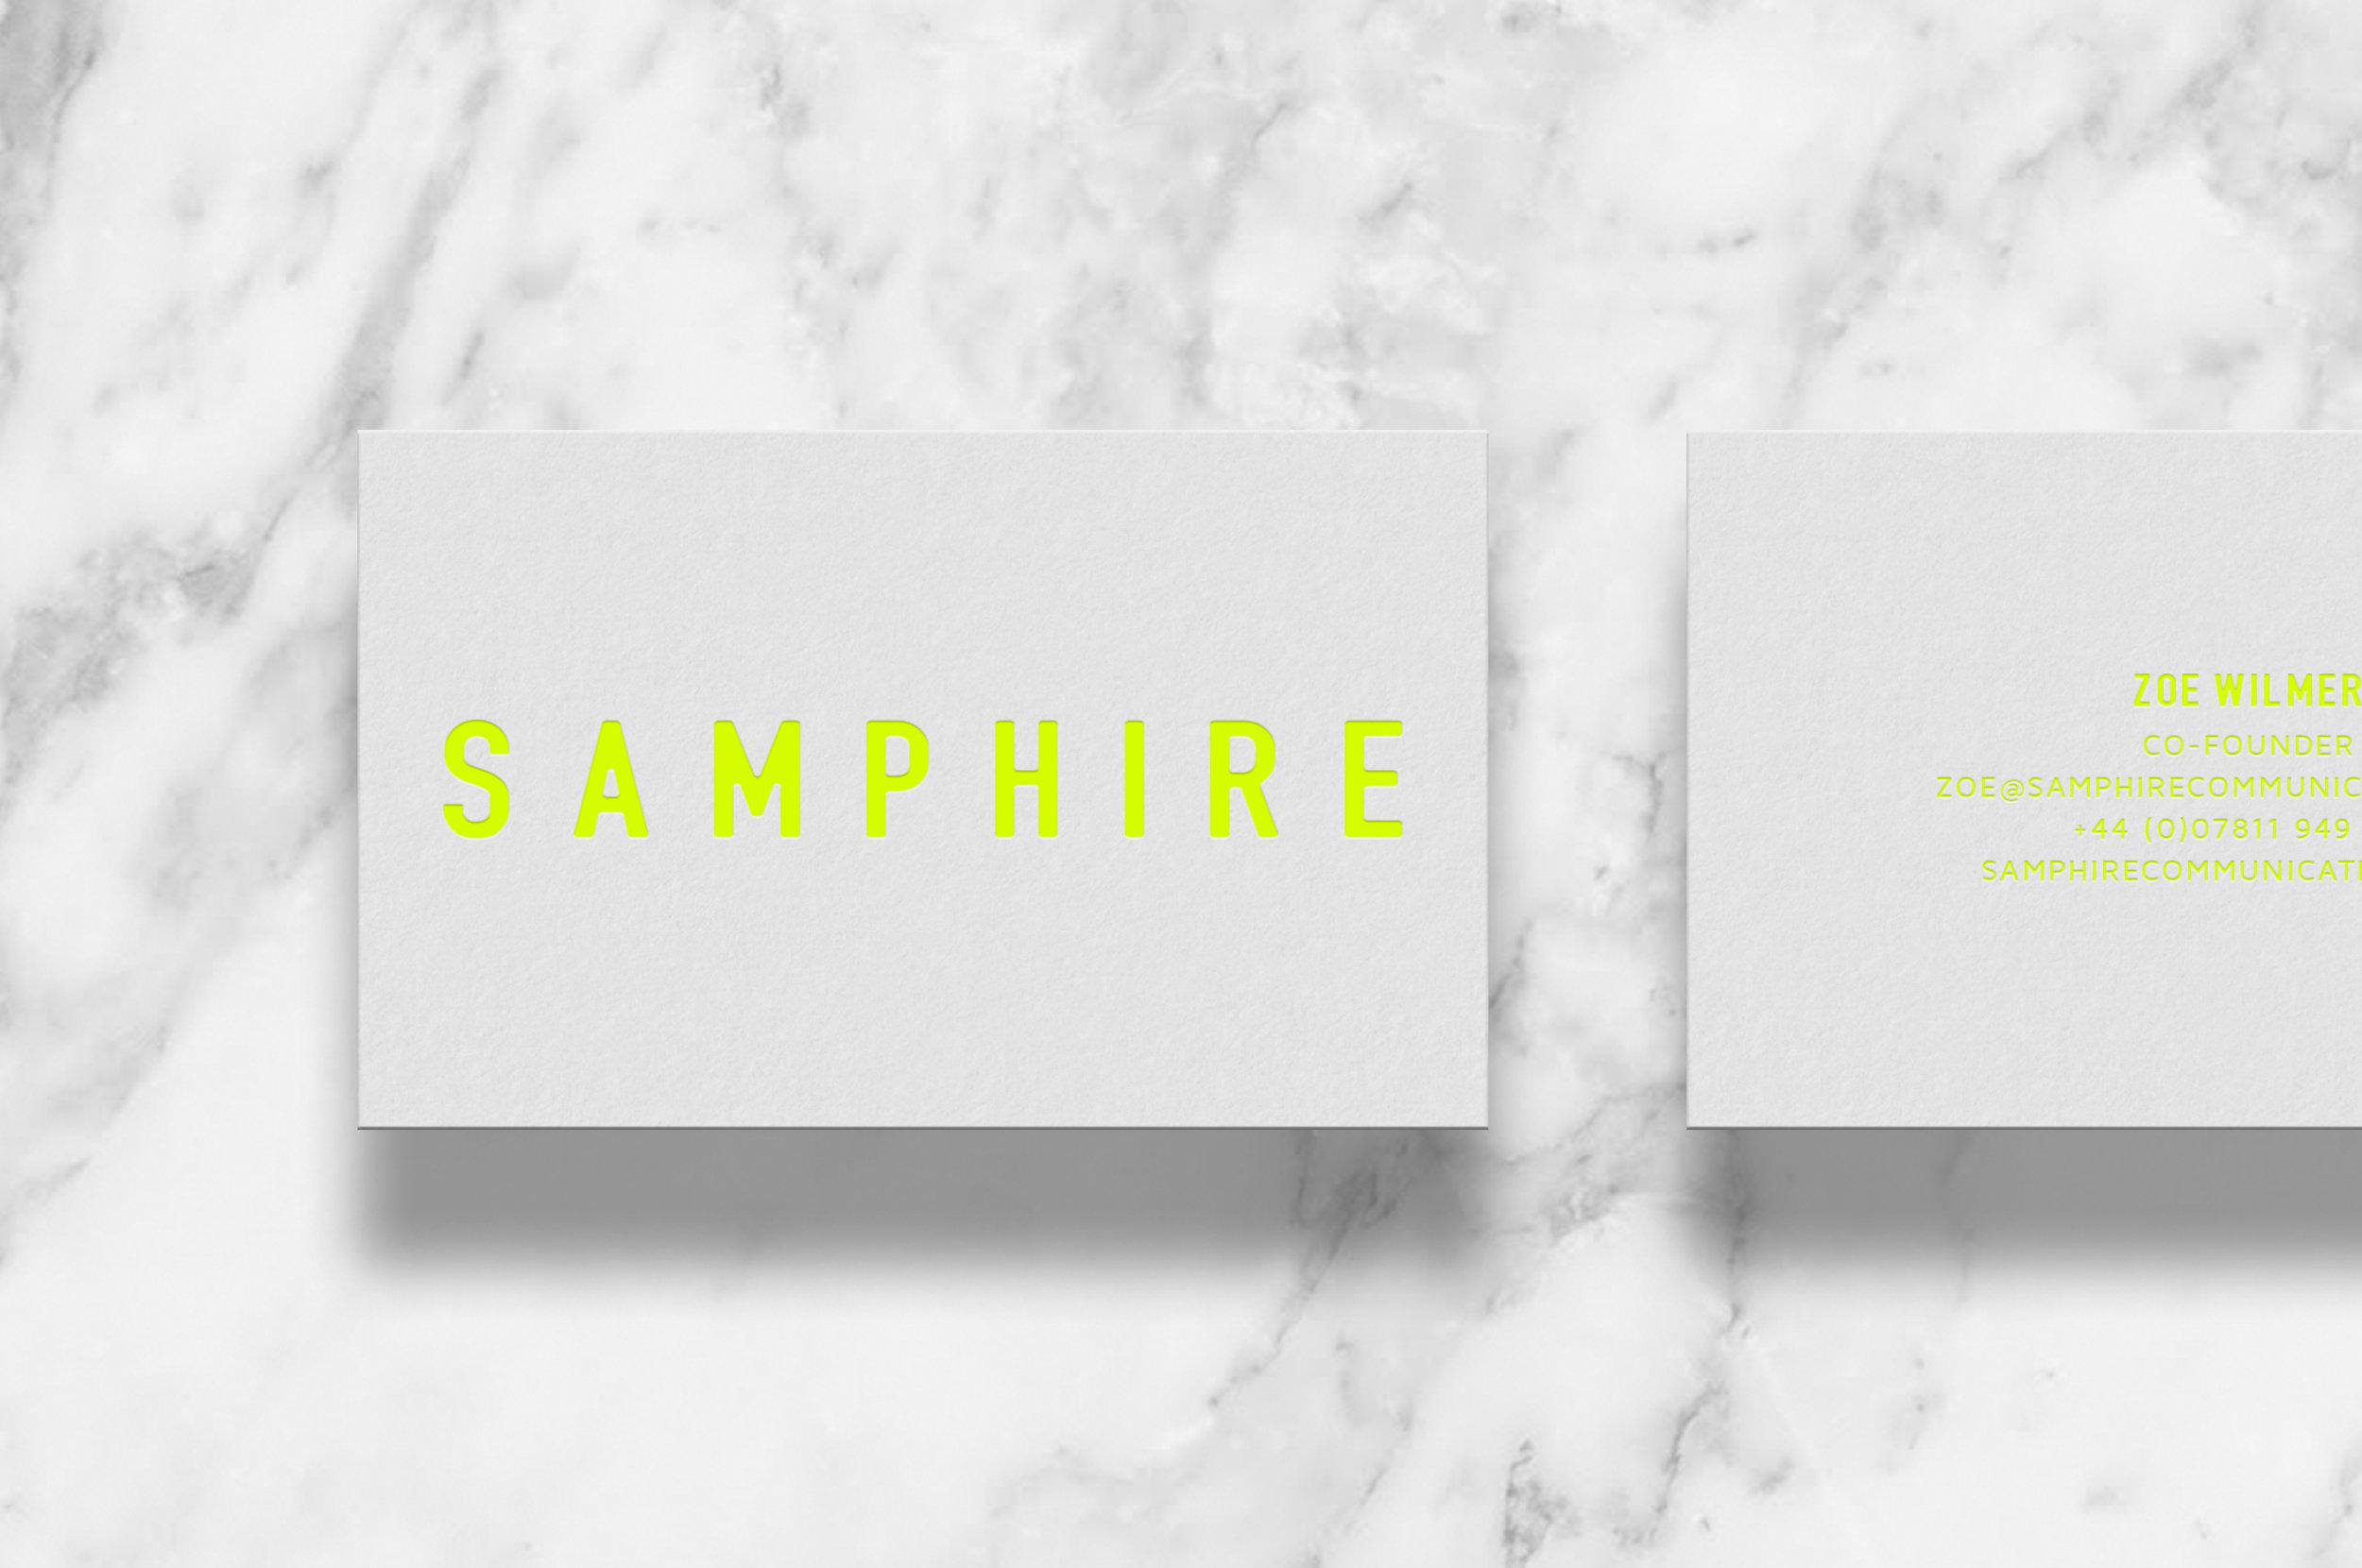 SAMPHIRE_communications_hoult_and_delis_graphic_design_branding.jpg